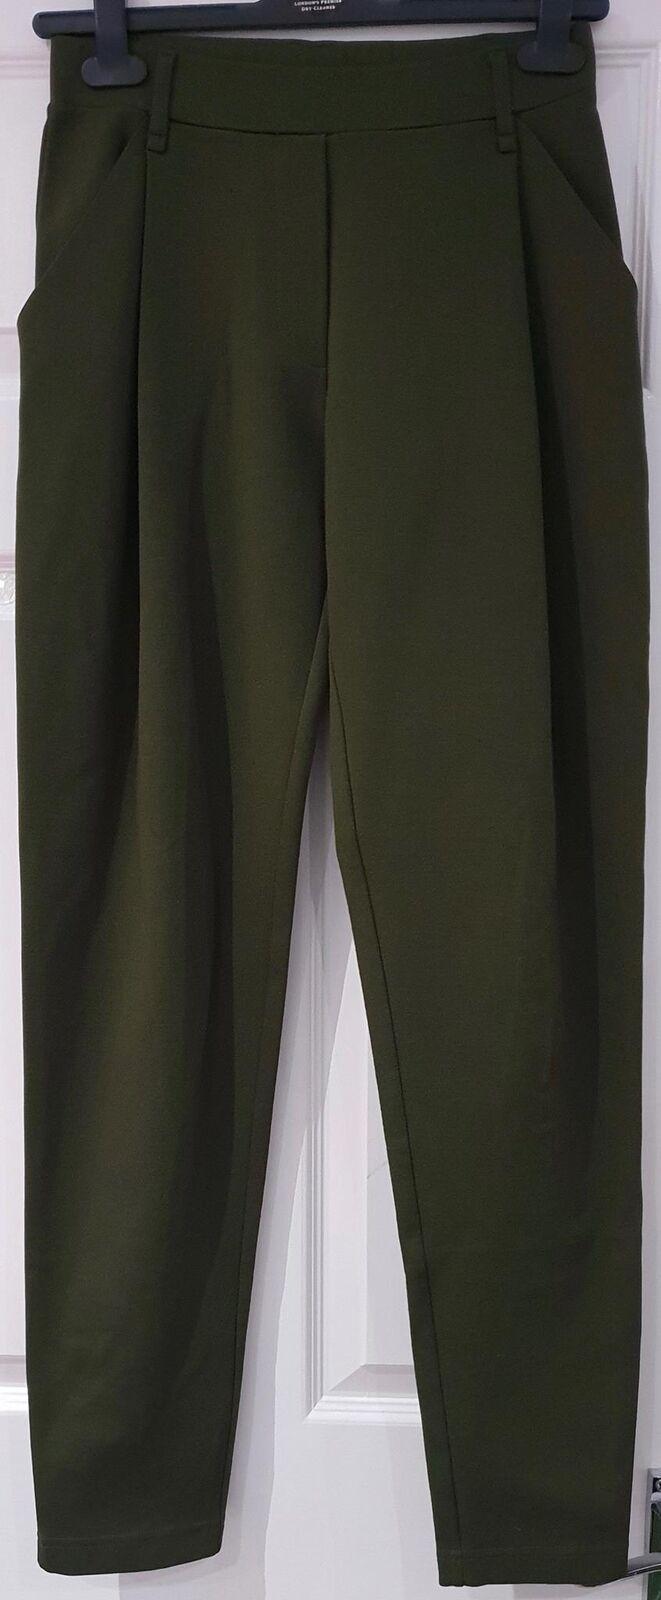 SUD Women's Olive Green Elasticated Waist Tapered Slim Leg Trousers Pants 40 UK8